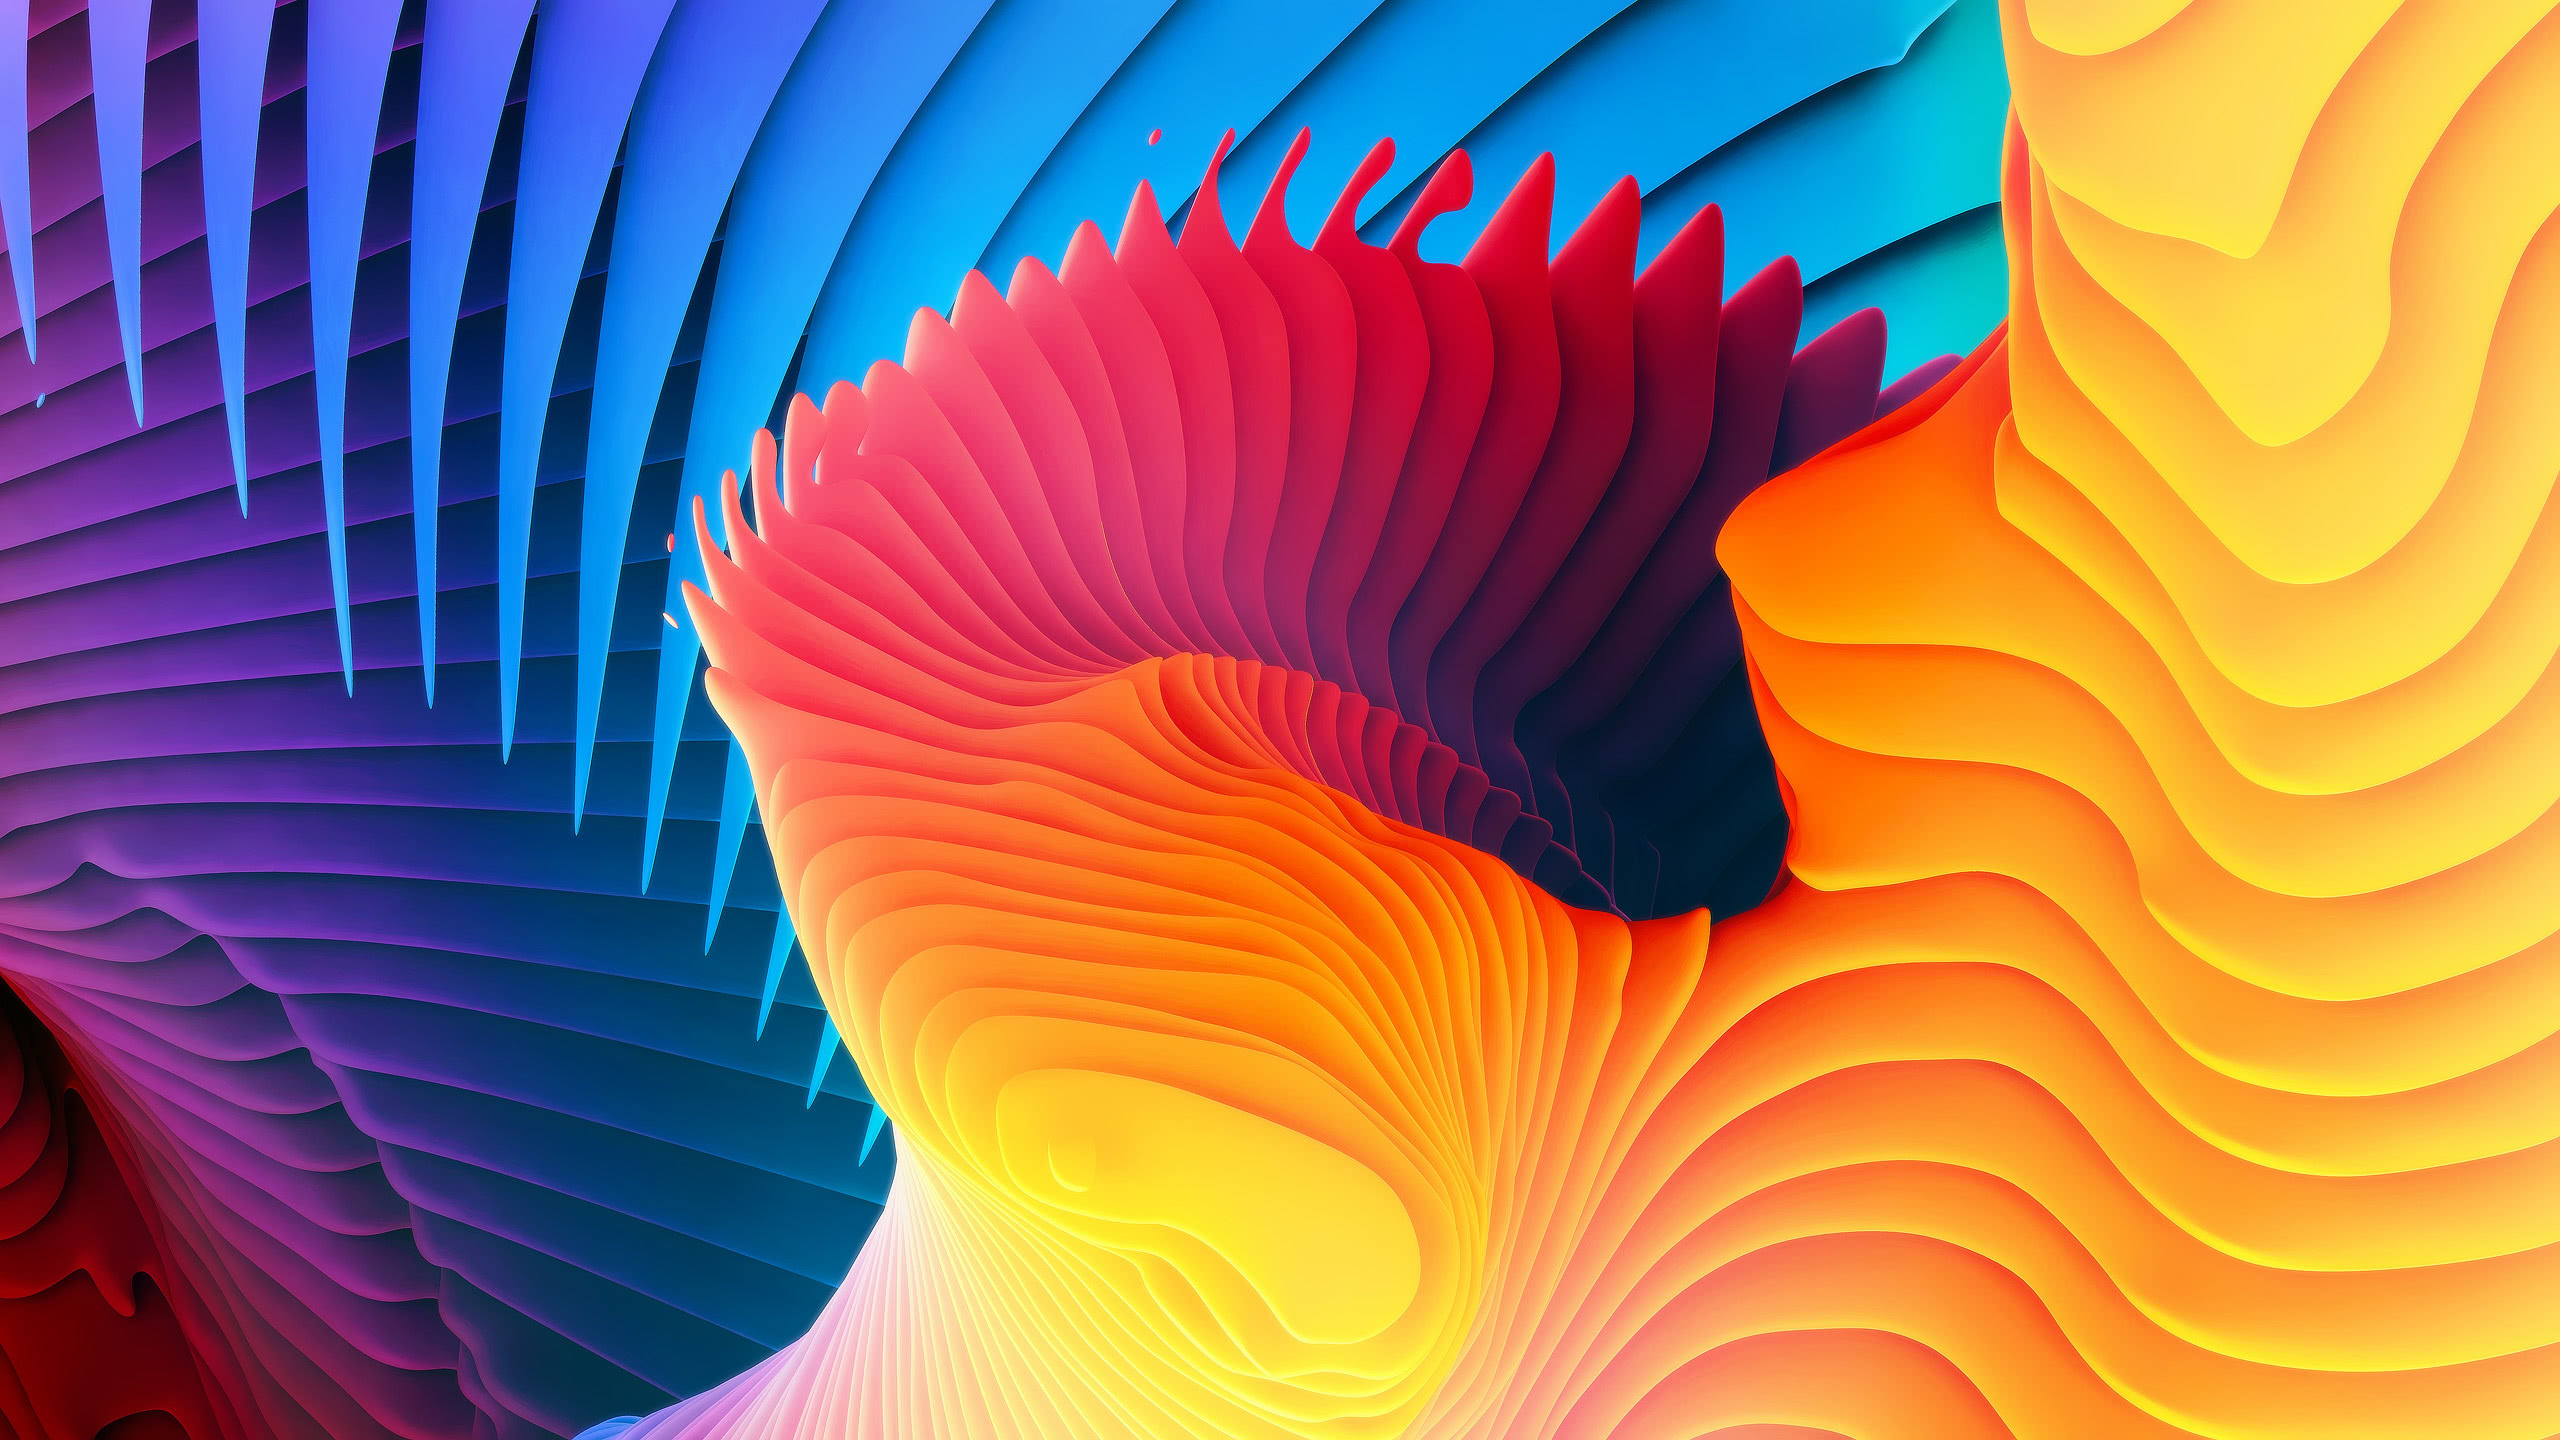 spiral colorful wqhd 1440p wallpaper